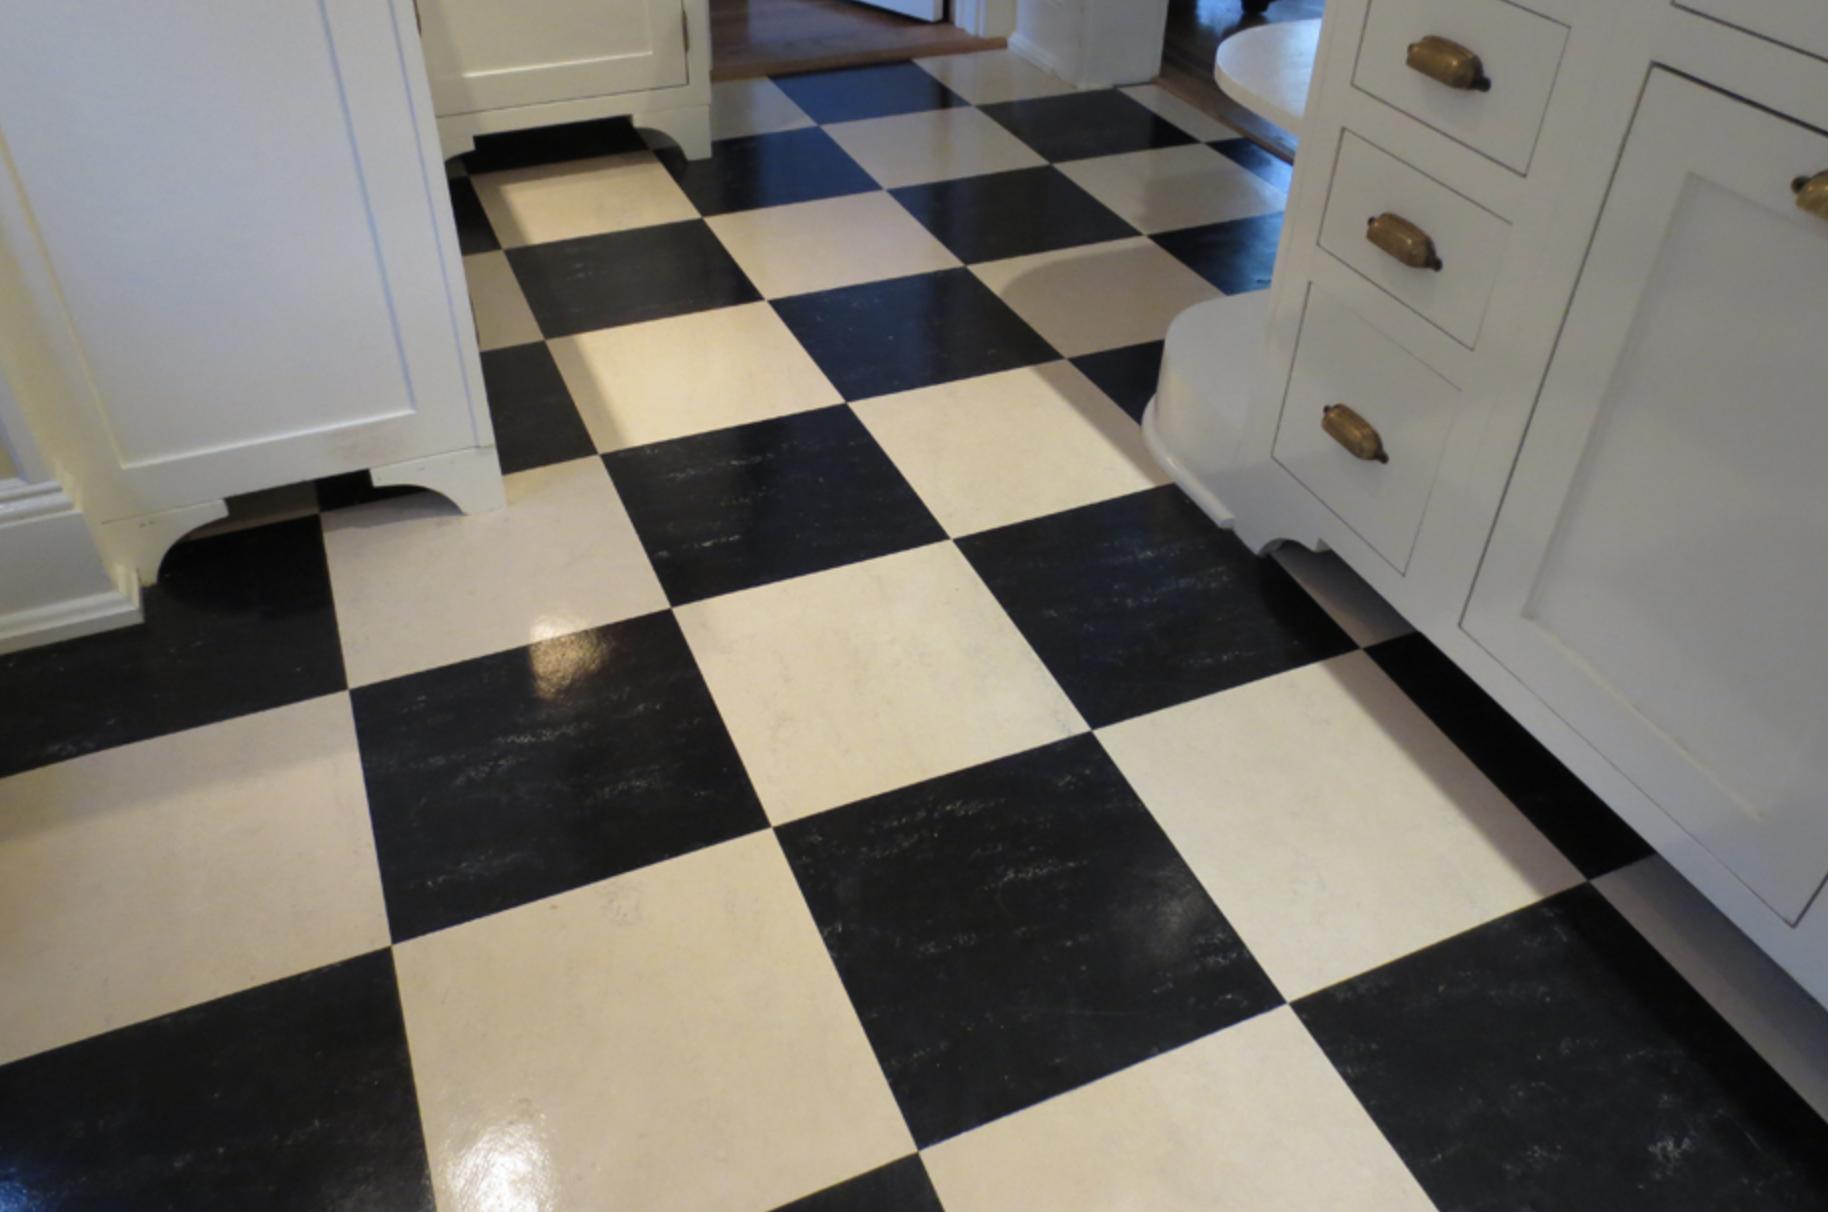 Aronson S Linoleum Tiles Rubber Flooring Kitchen Rubber Floor Tiles Flooring